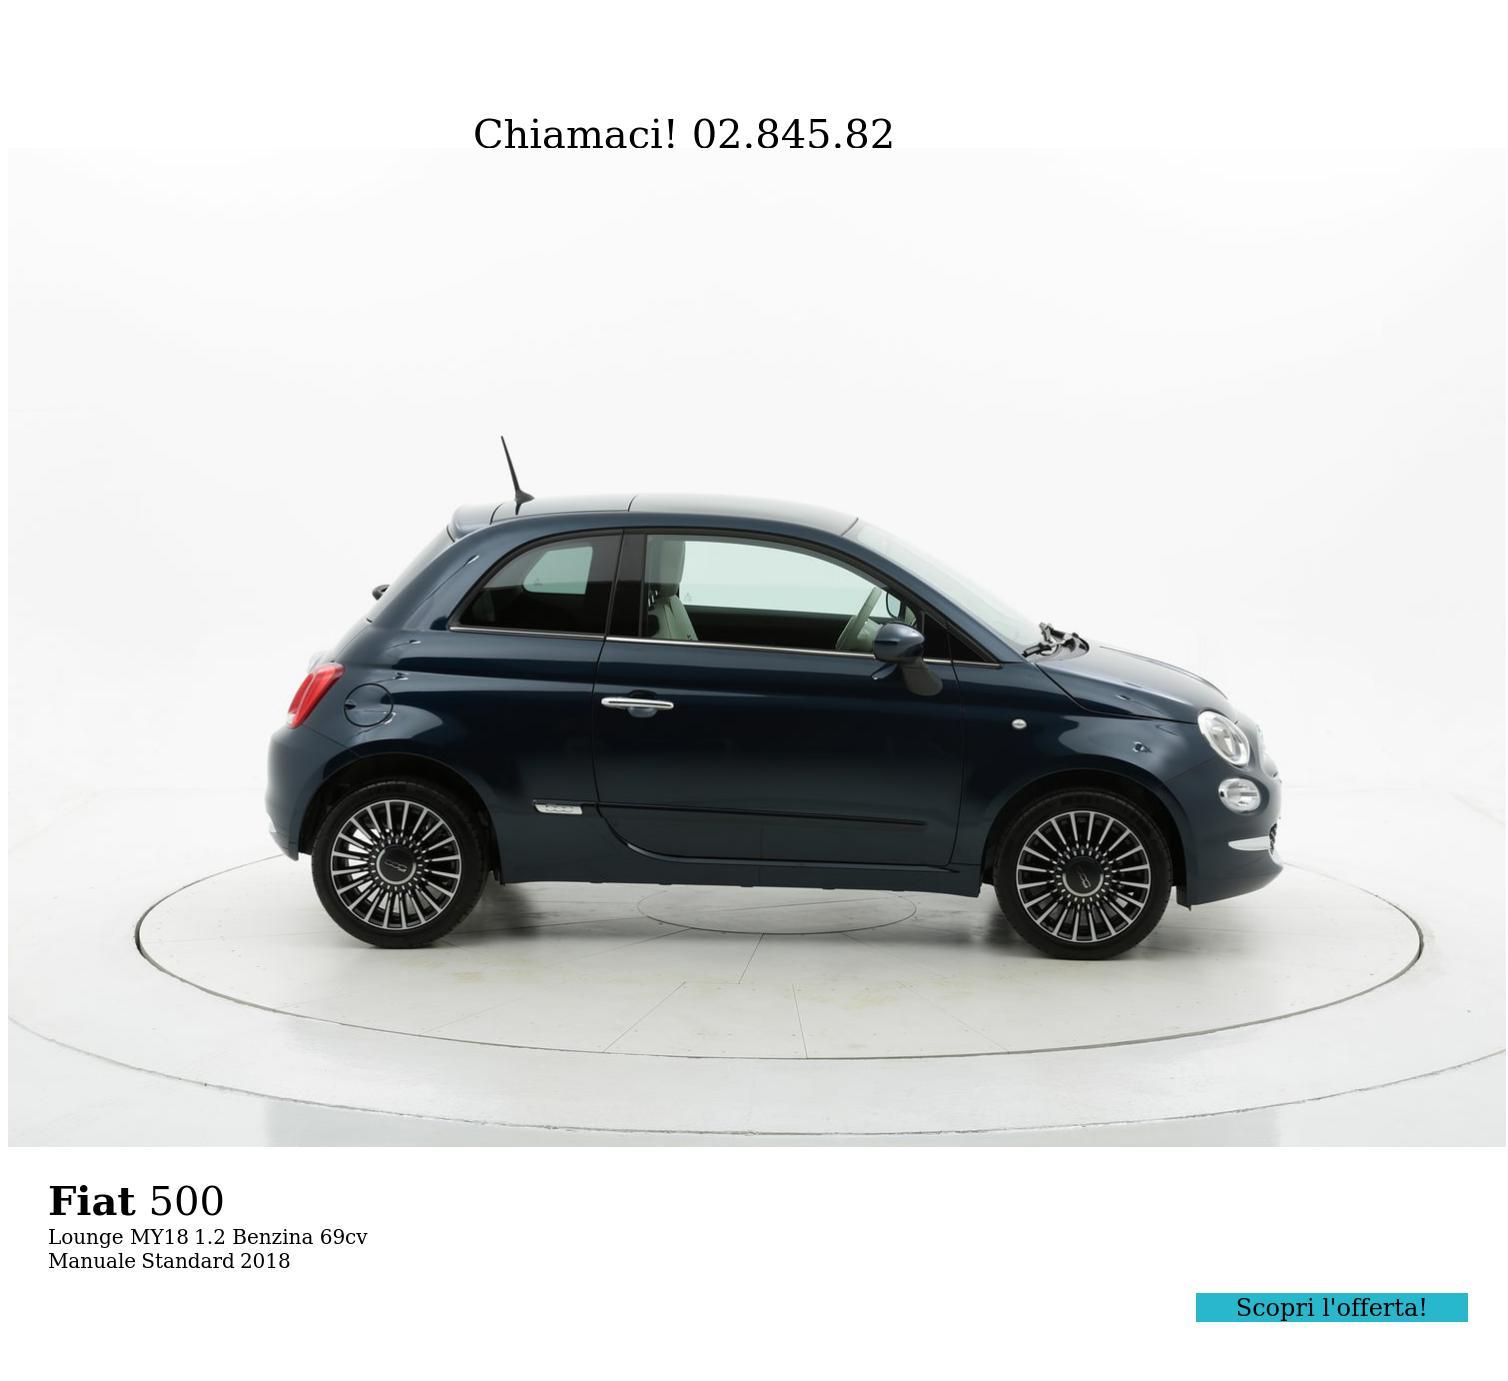 Fiat 500 Lounge MY18 km 0 benzina blu | brumbrum